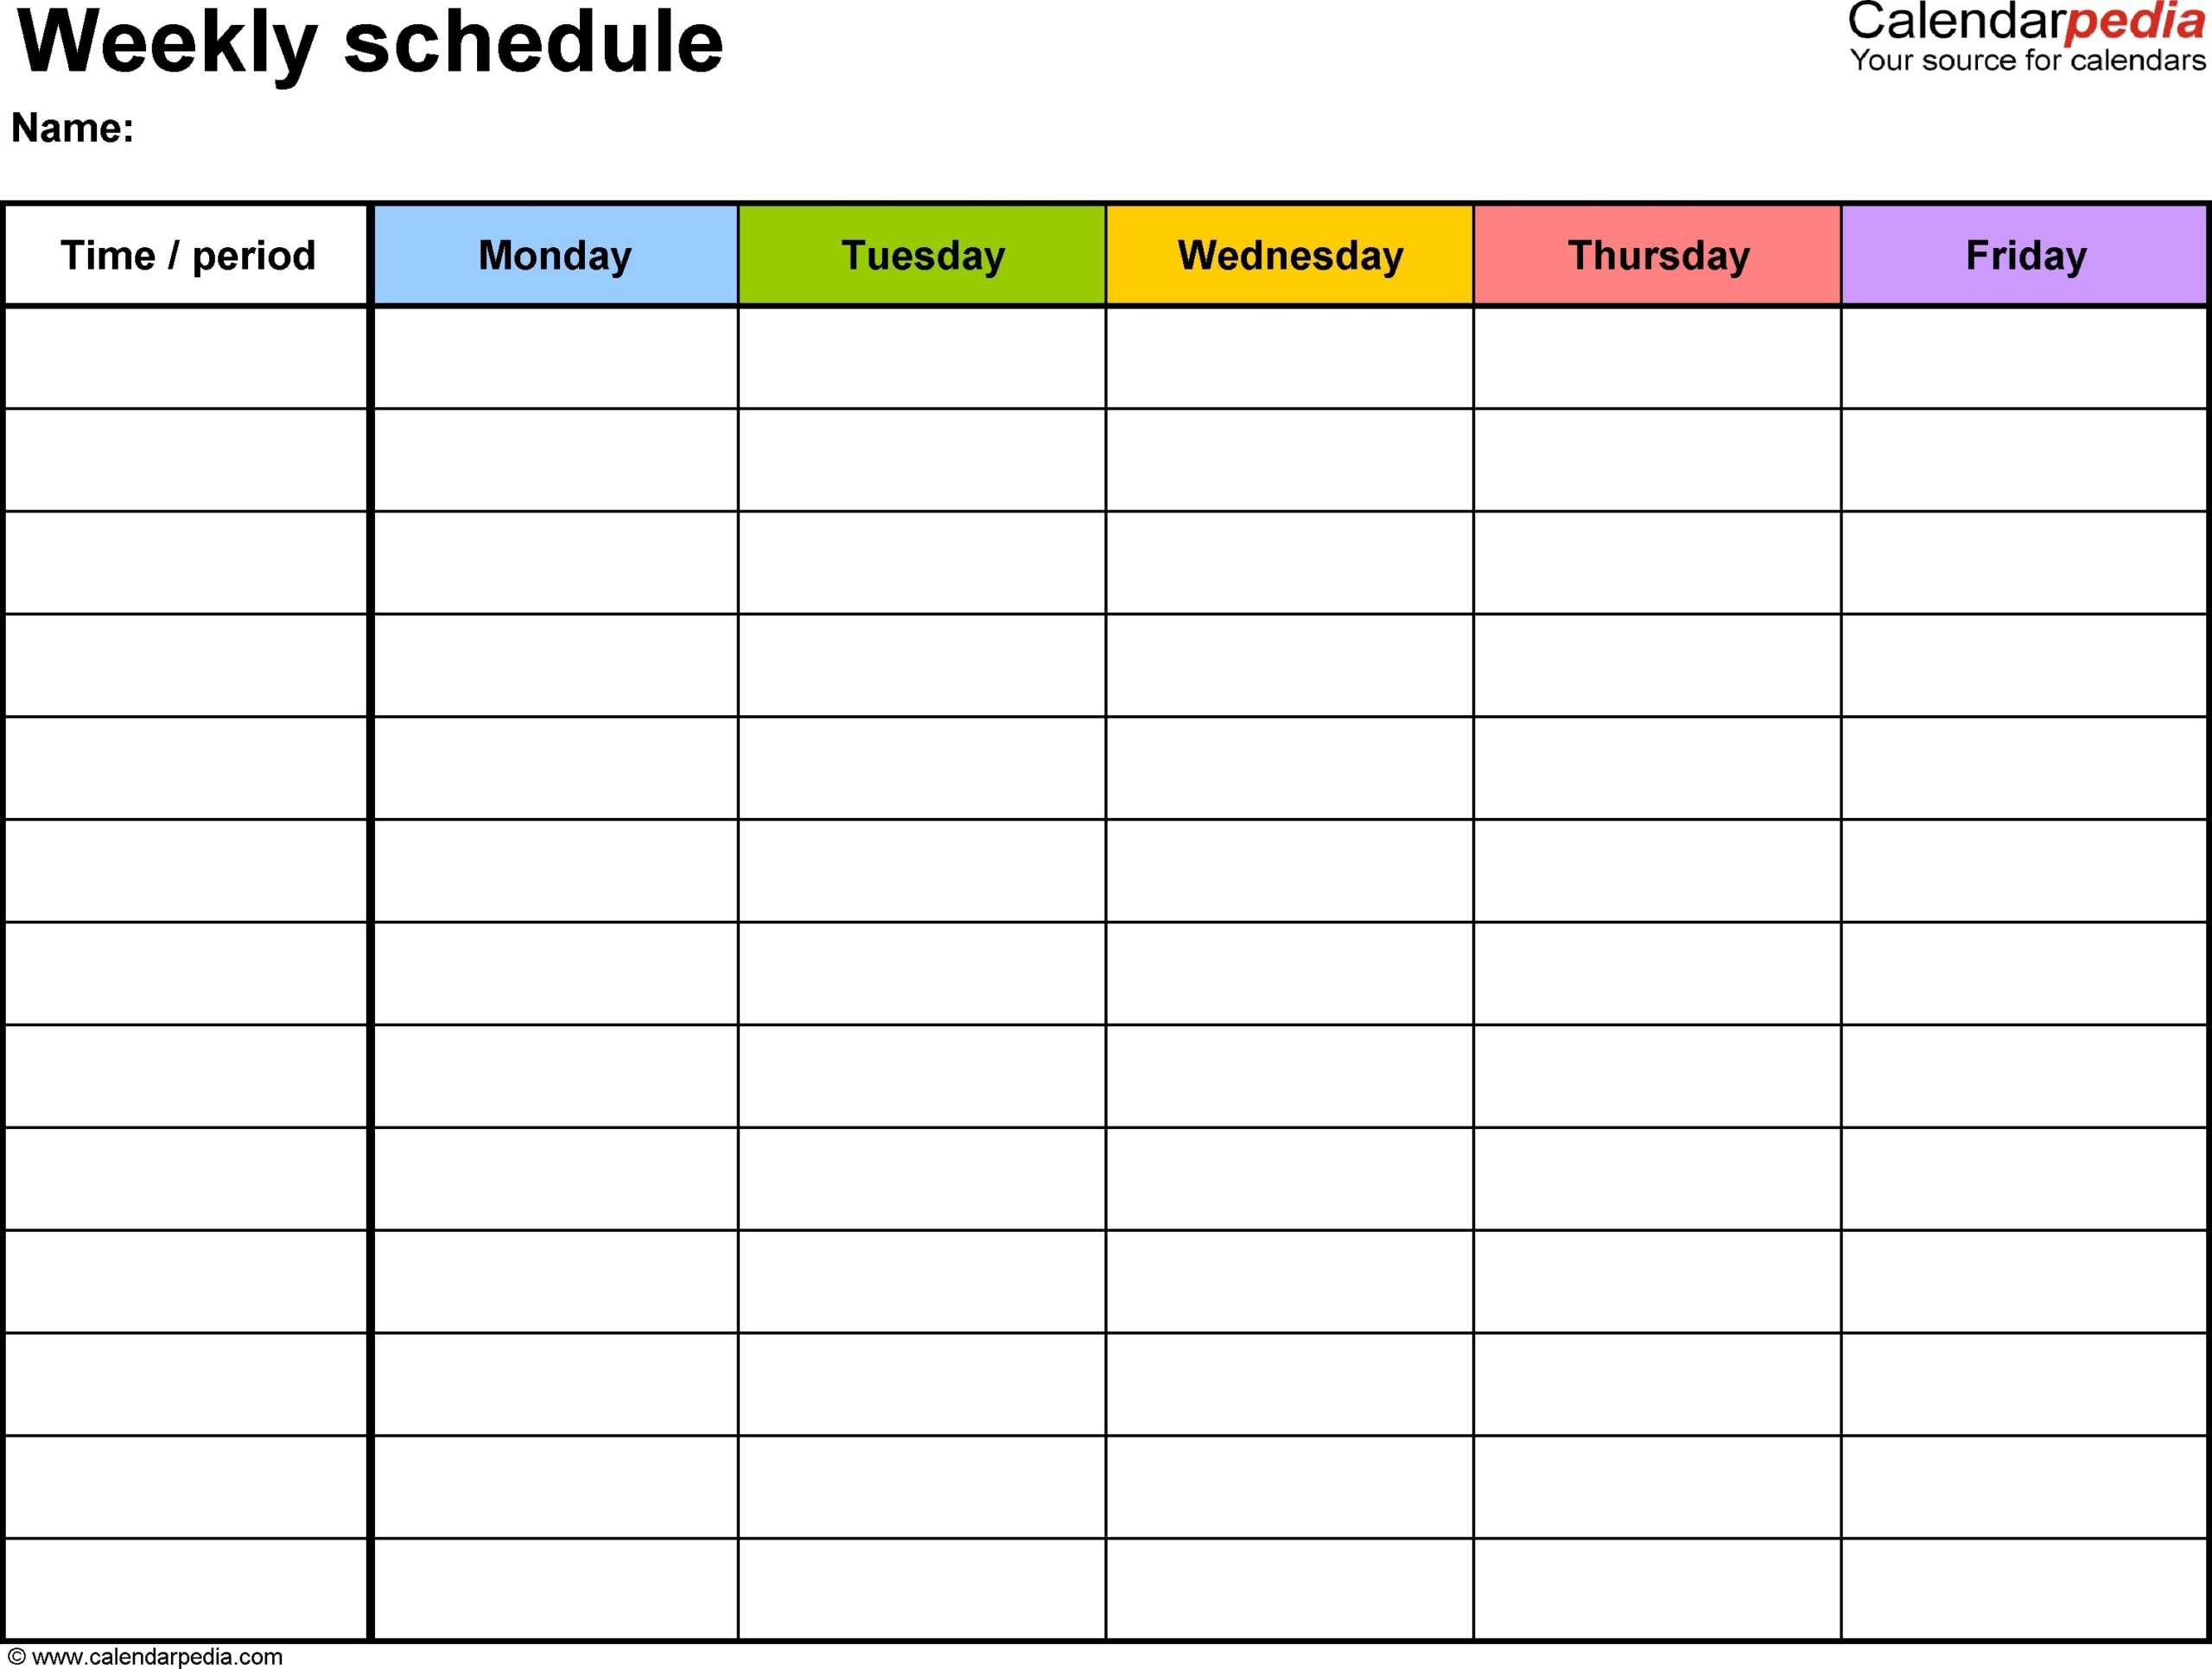 Printable Blank Fill In Monthly Calendar 2021 | Calendar Online Calendar To Fill In